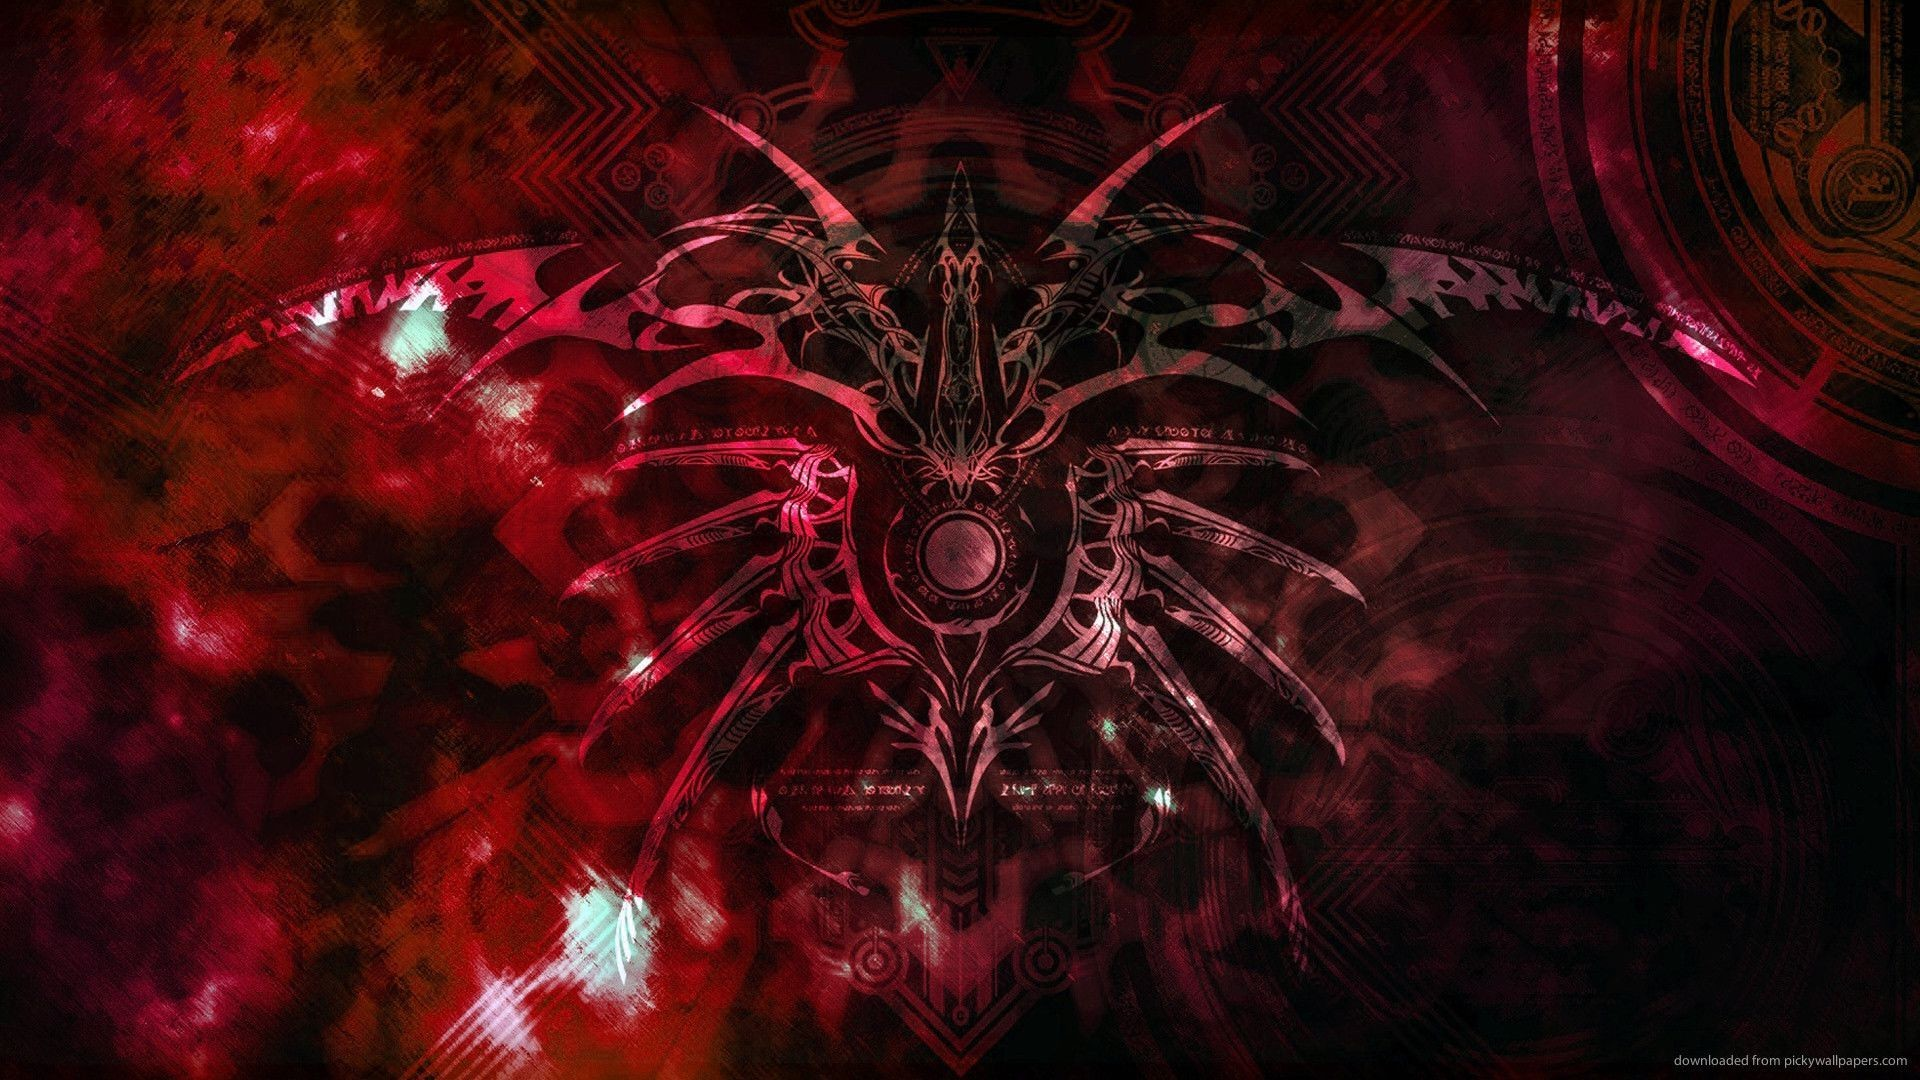 Space Demonic Art Hd Wallpaper: Evil Backgrounds ·①